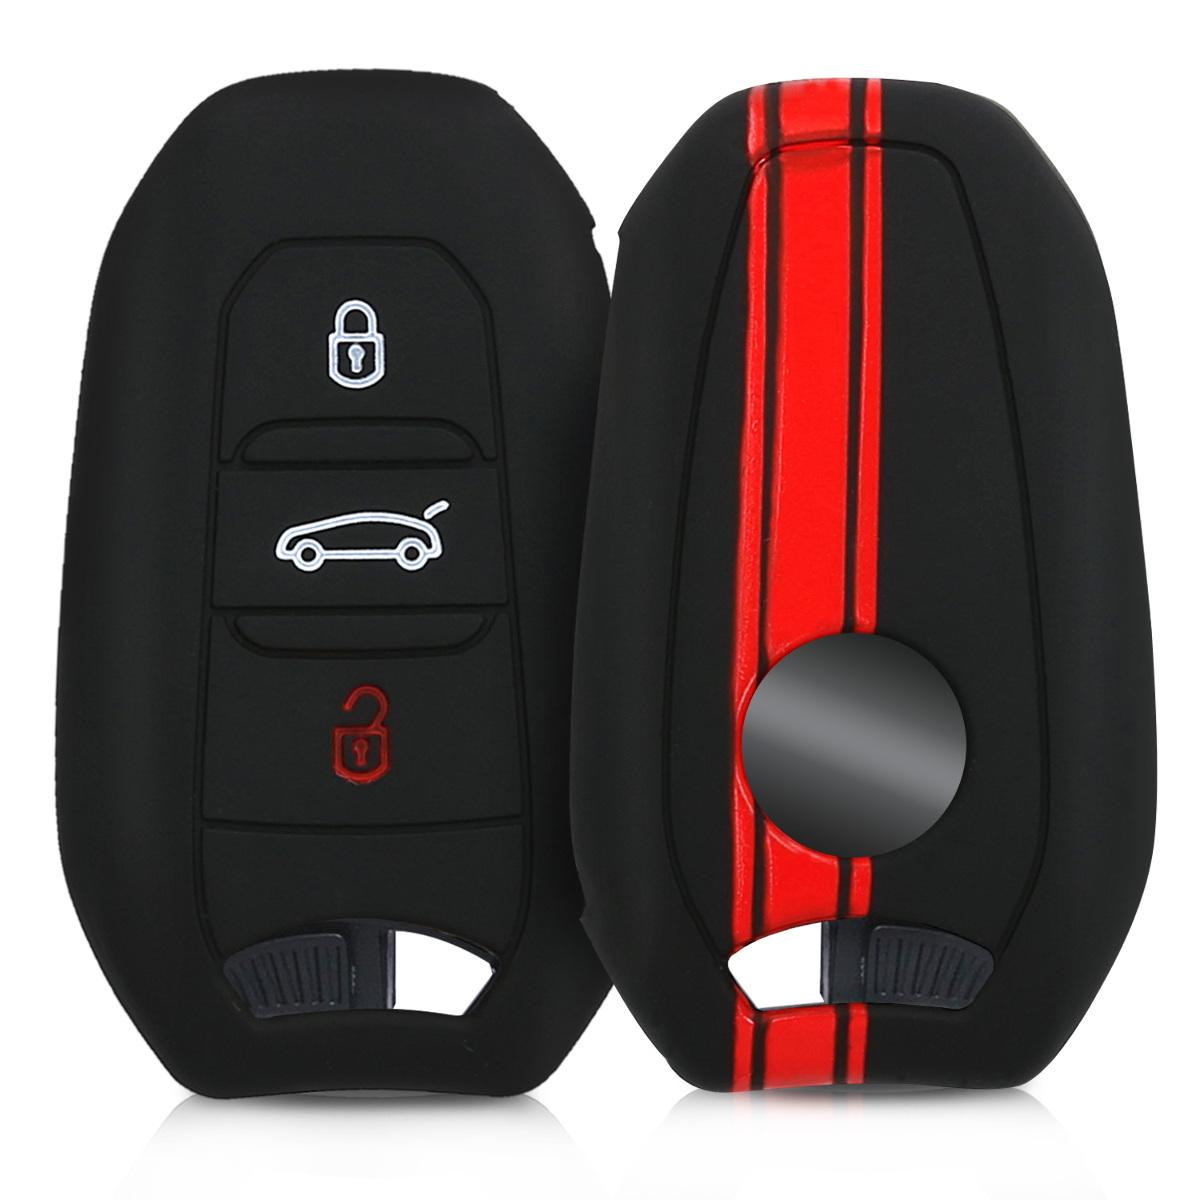 KW Silicone Θήκη Κλειδιού Peugeot Citroen - 3 κουμπιά - Red / Black (45654.01)